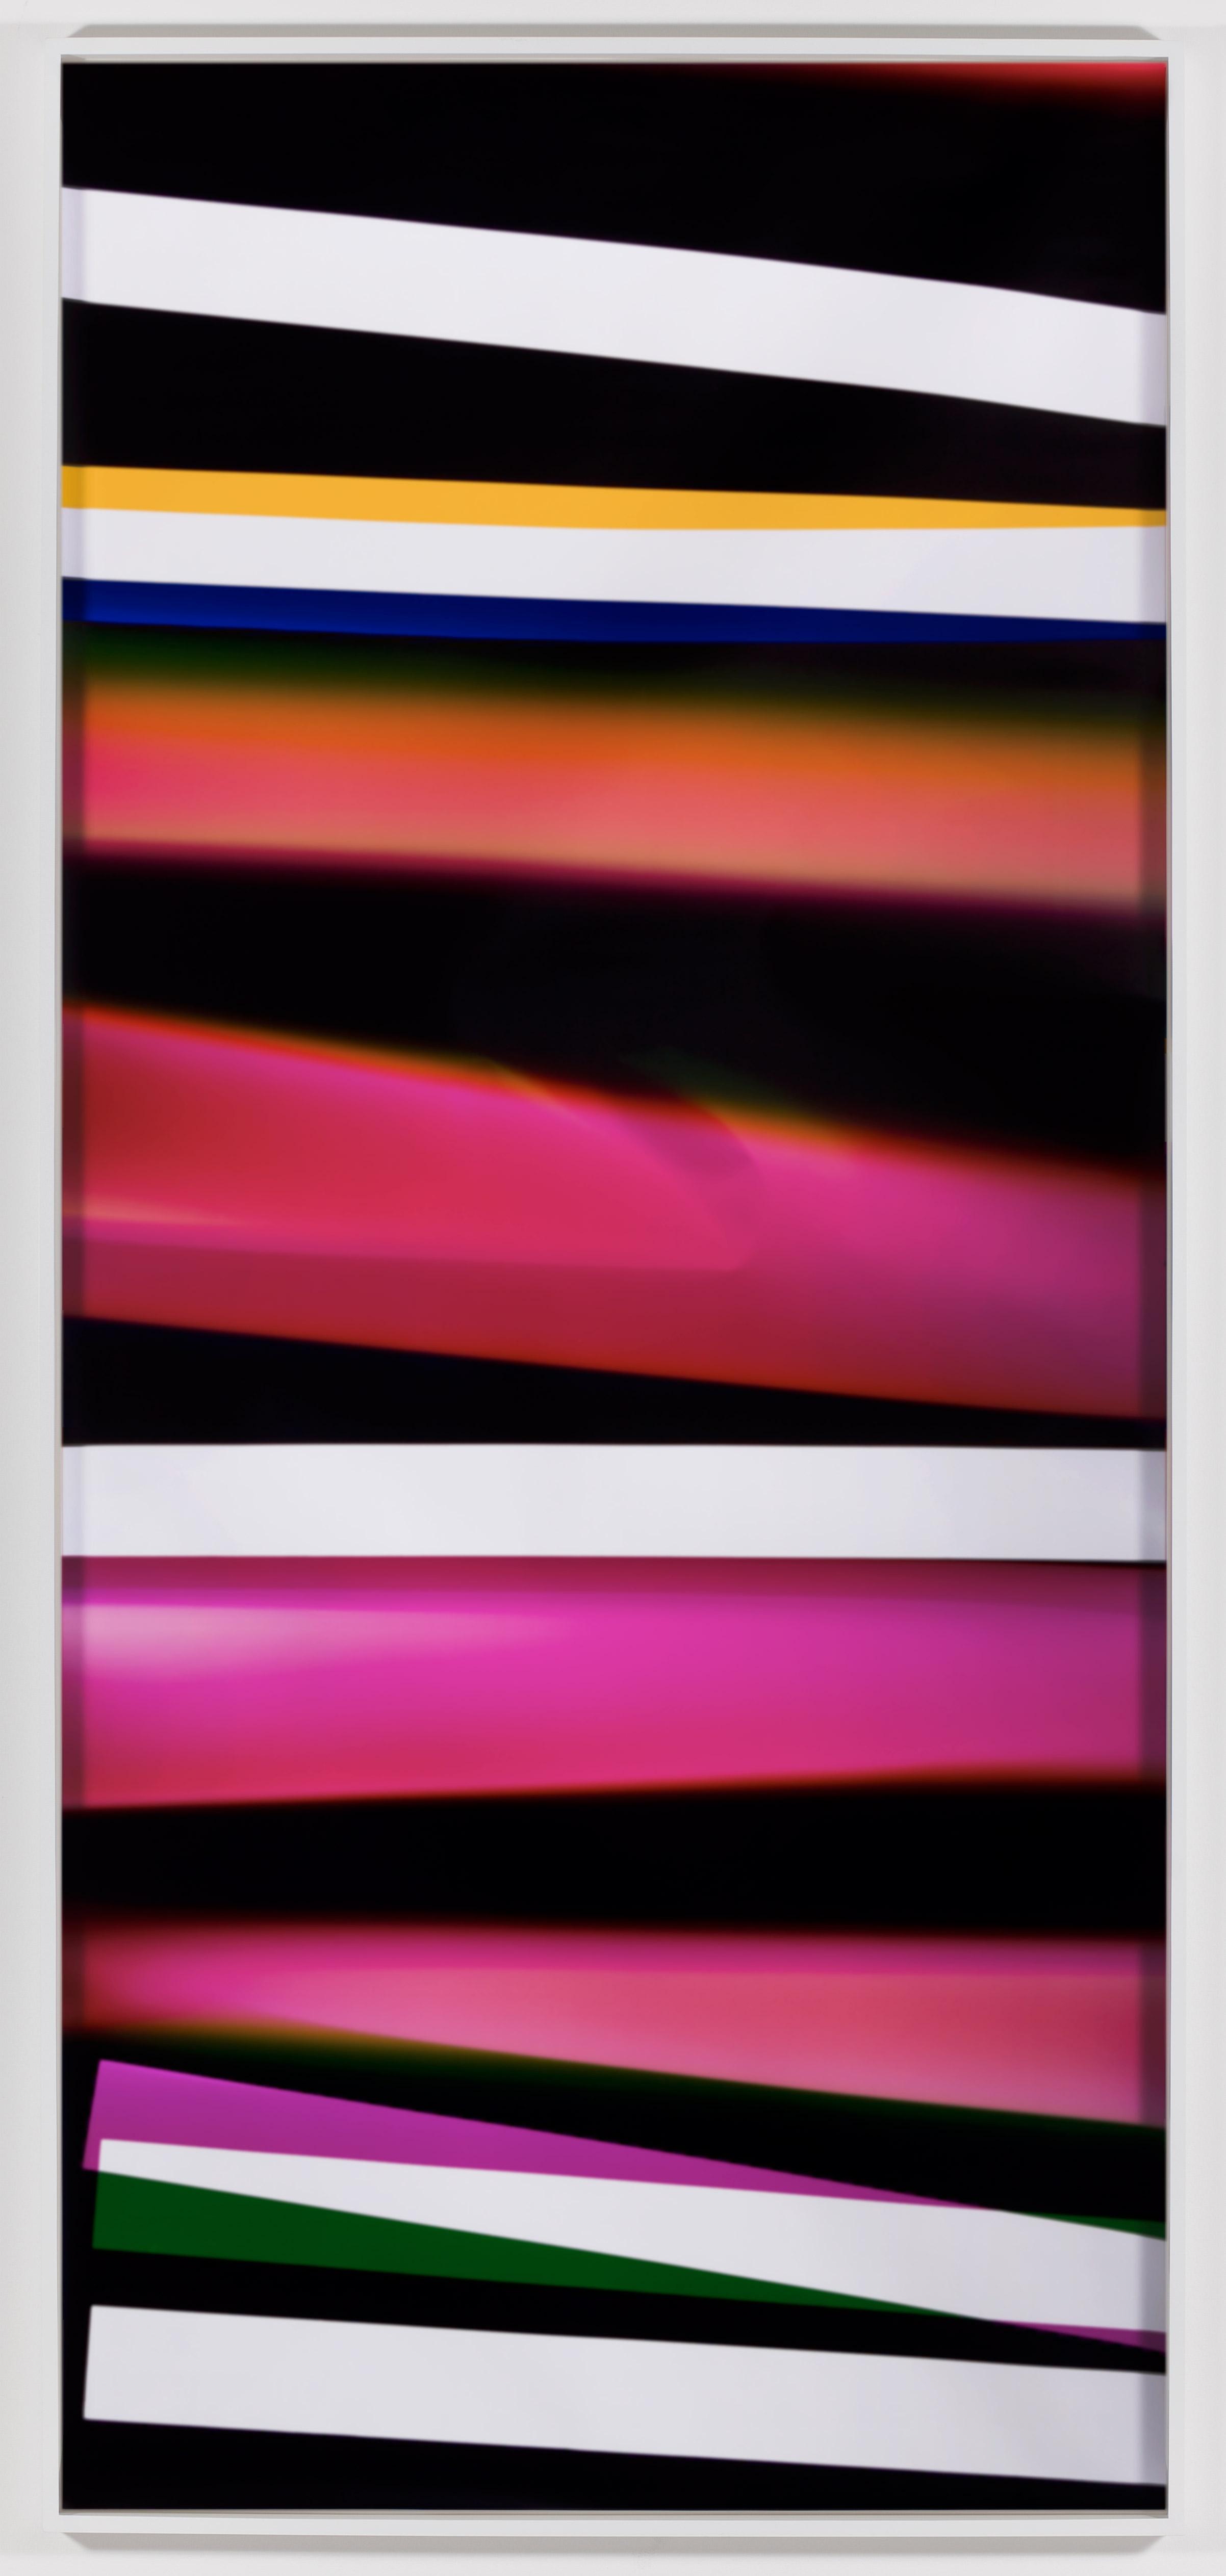 Black Curl (CMY/Five Magnet: Irvine, California, March 26,2010, Fujicolor Crystal Archive Super Type C, Em. No. 165-021, 06910)   2011  Color photographic paper  111 x 50 inches   Black Curls, 2010–2013    PROCESSCOLORFIELDS, 2011